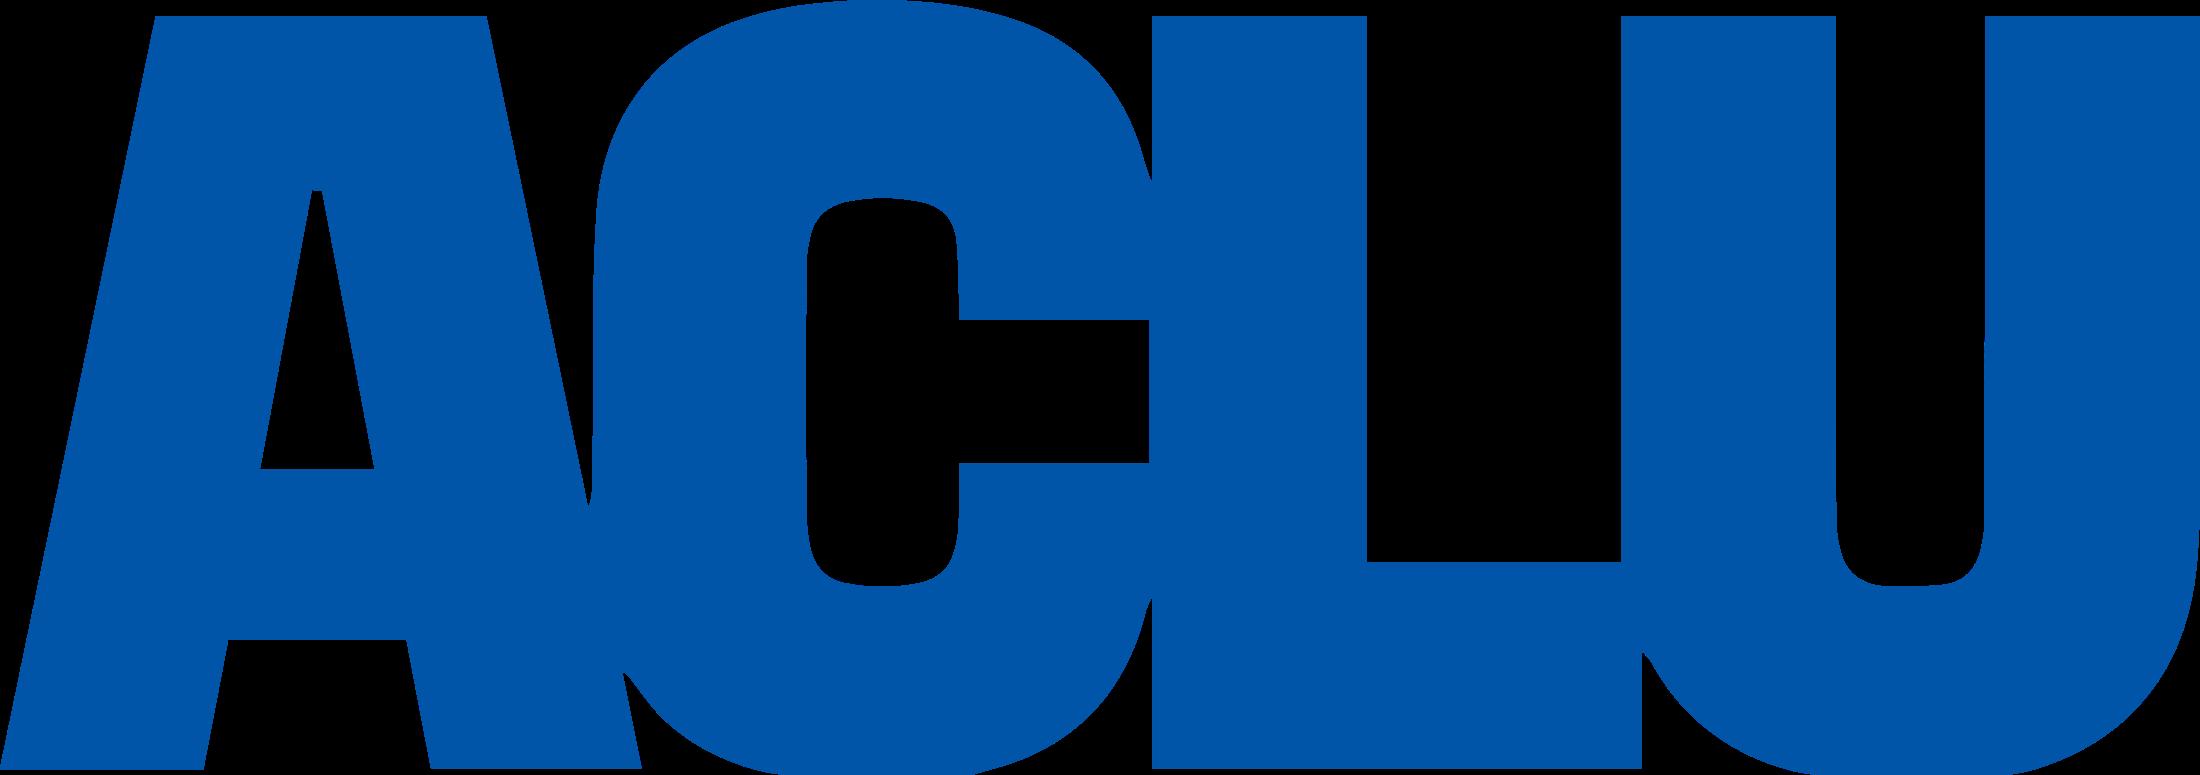 american-civil-liberties-union-logo.png